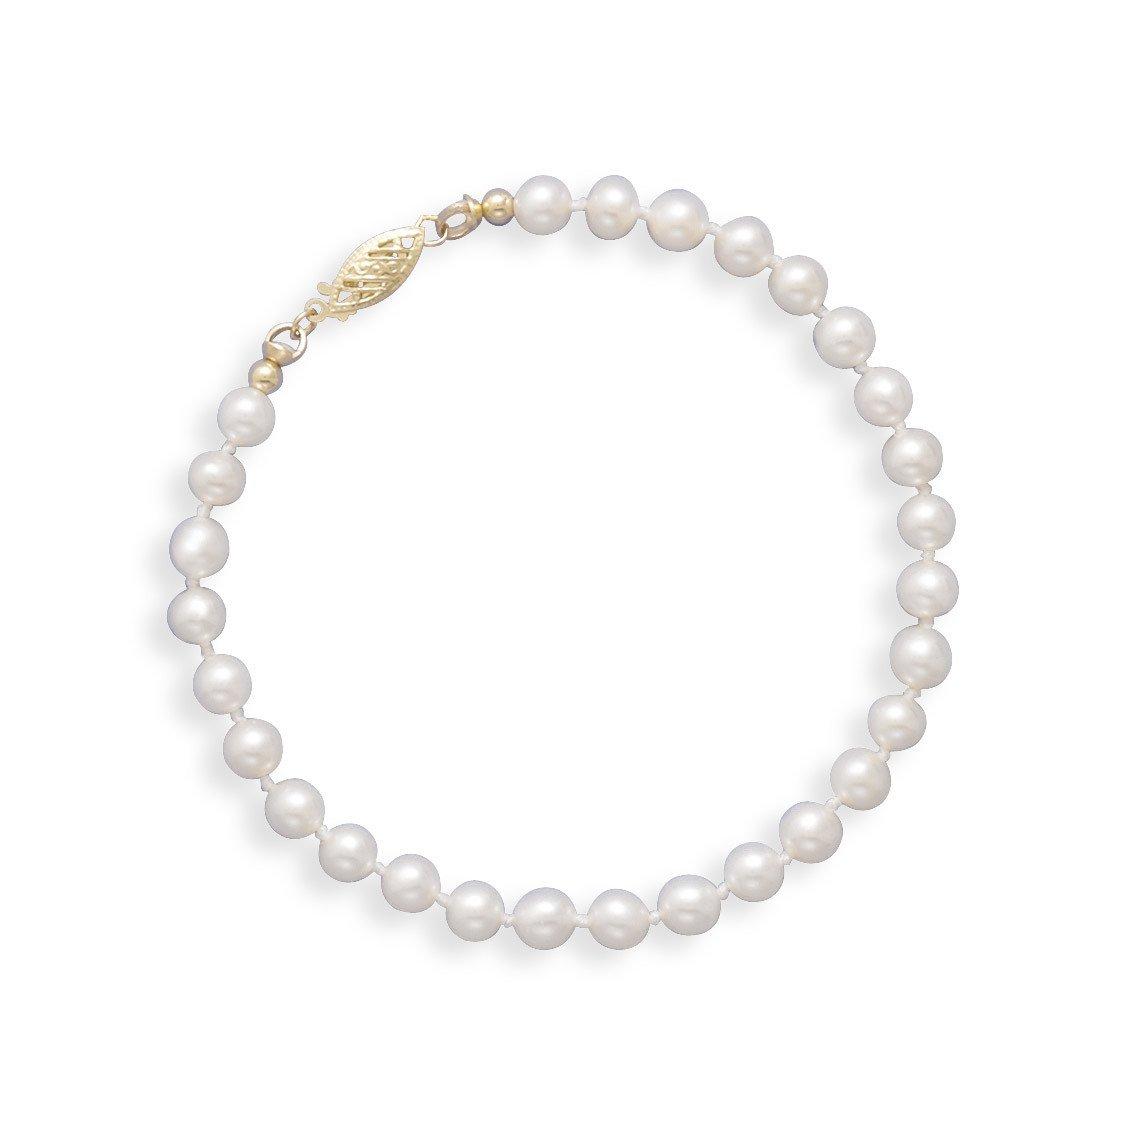 7″ 5-5.5mm Cultured Freshwater Pearl Bracelet